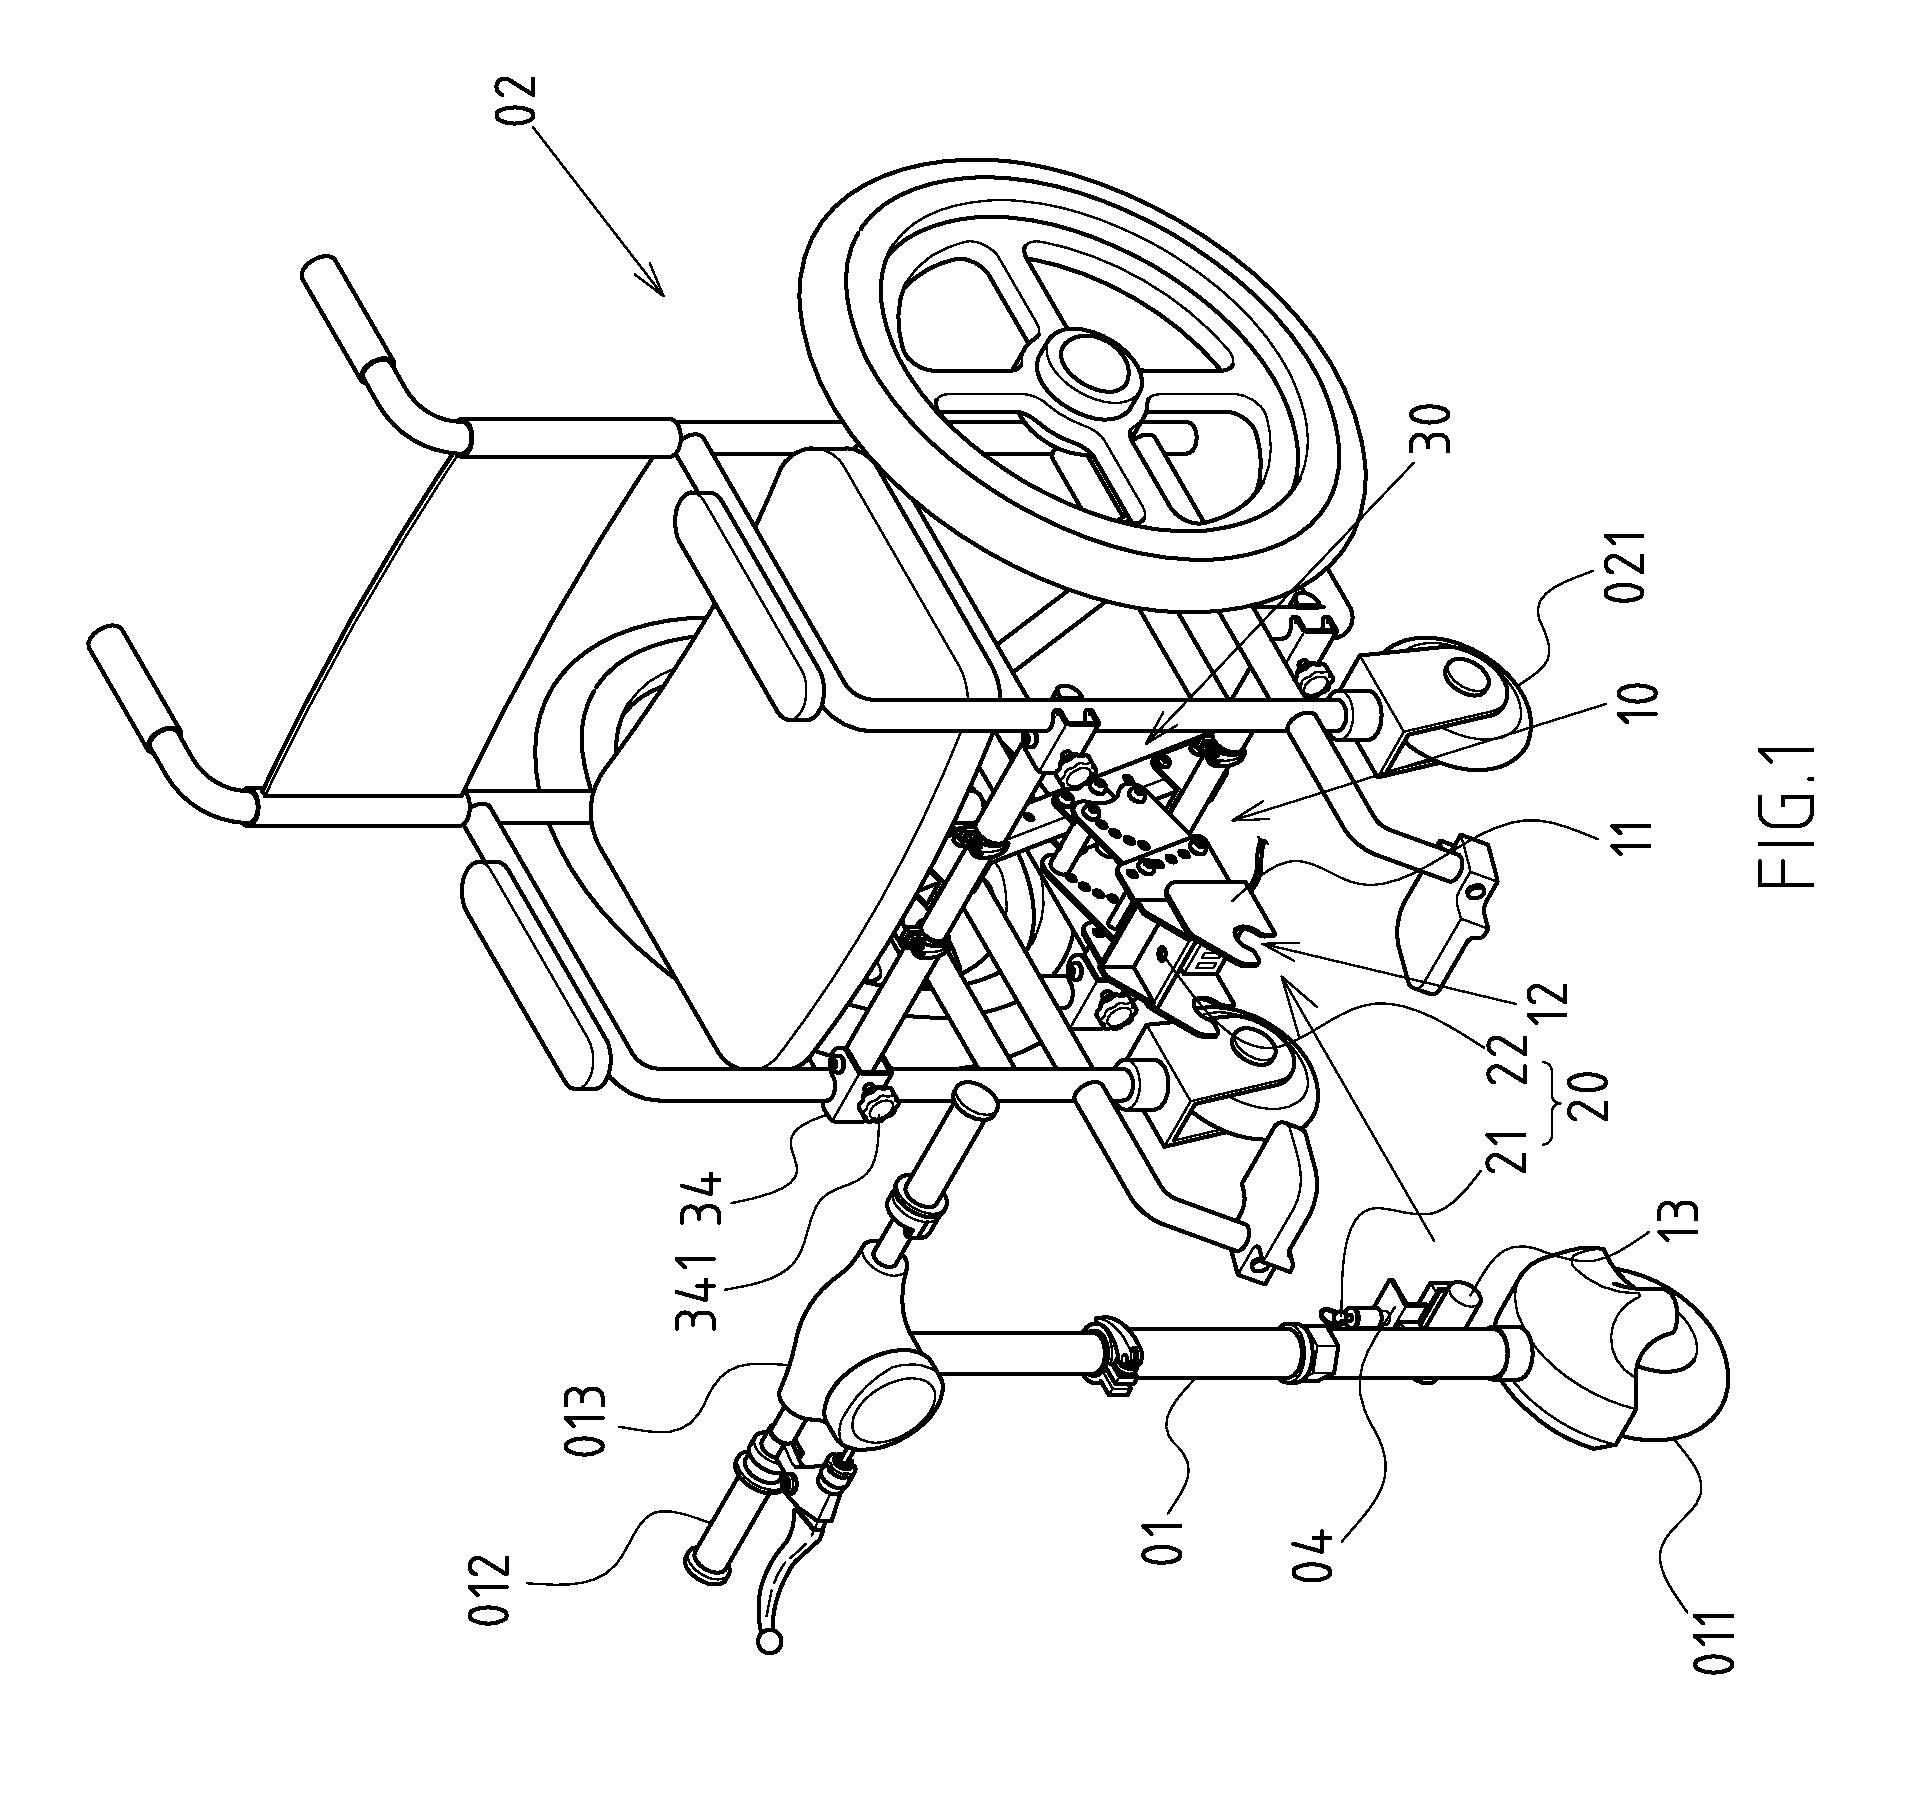 Mechanism Wheel Lever : Brevet us  quick release mechanism for wheel